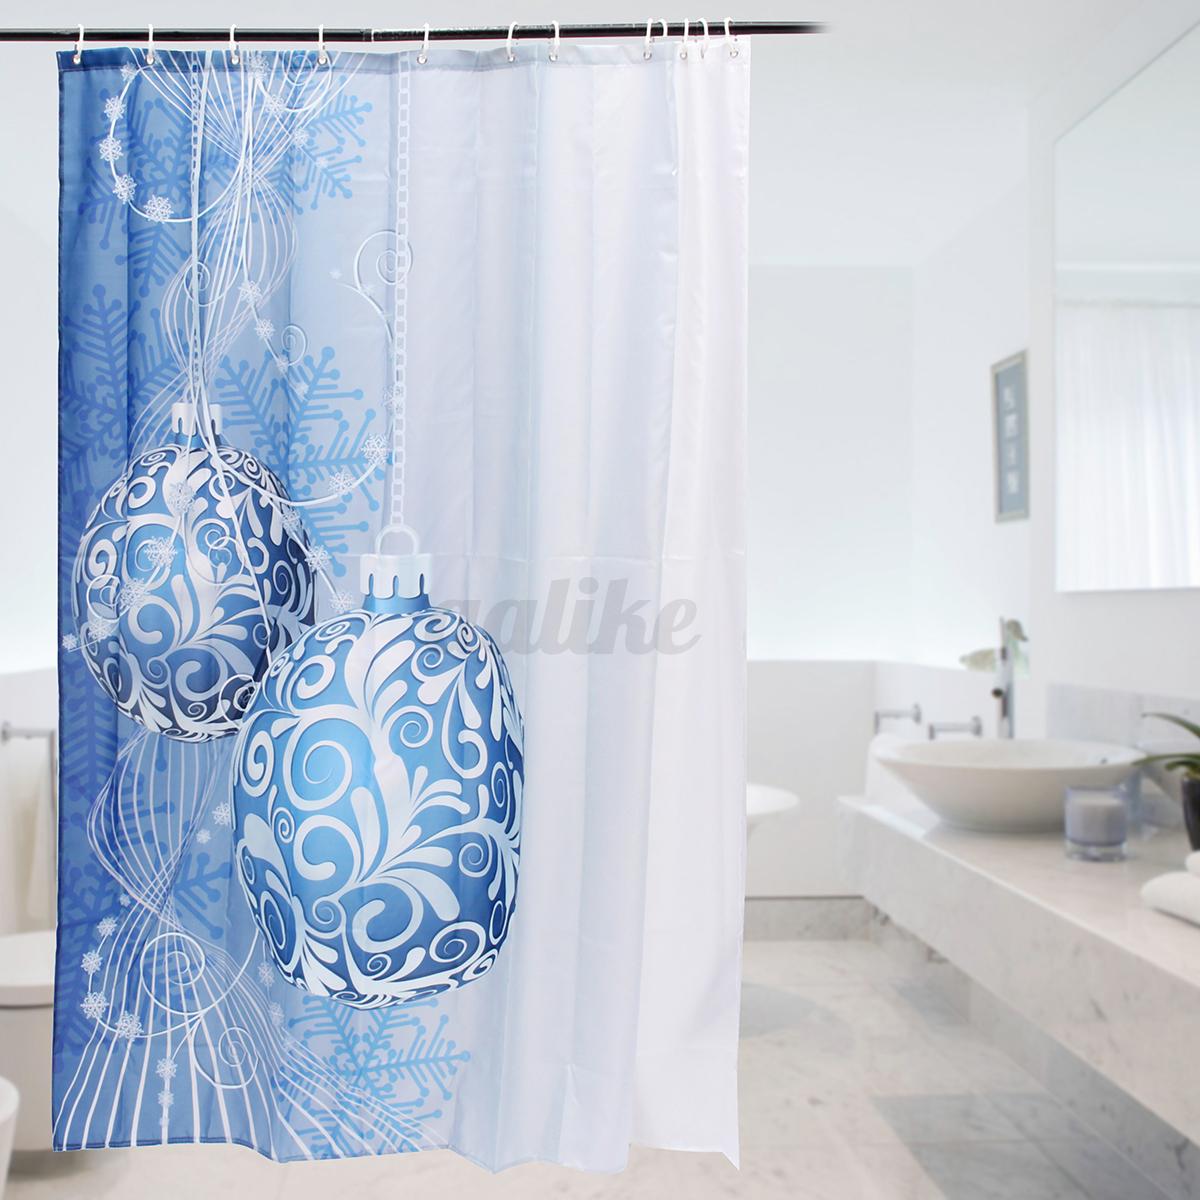 Waterproof fabric christmas bathroom shower curtain panel 12 hooks 180x180cm ebay for Bathroom holiday shower curtains